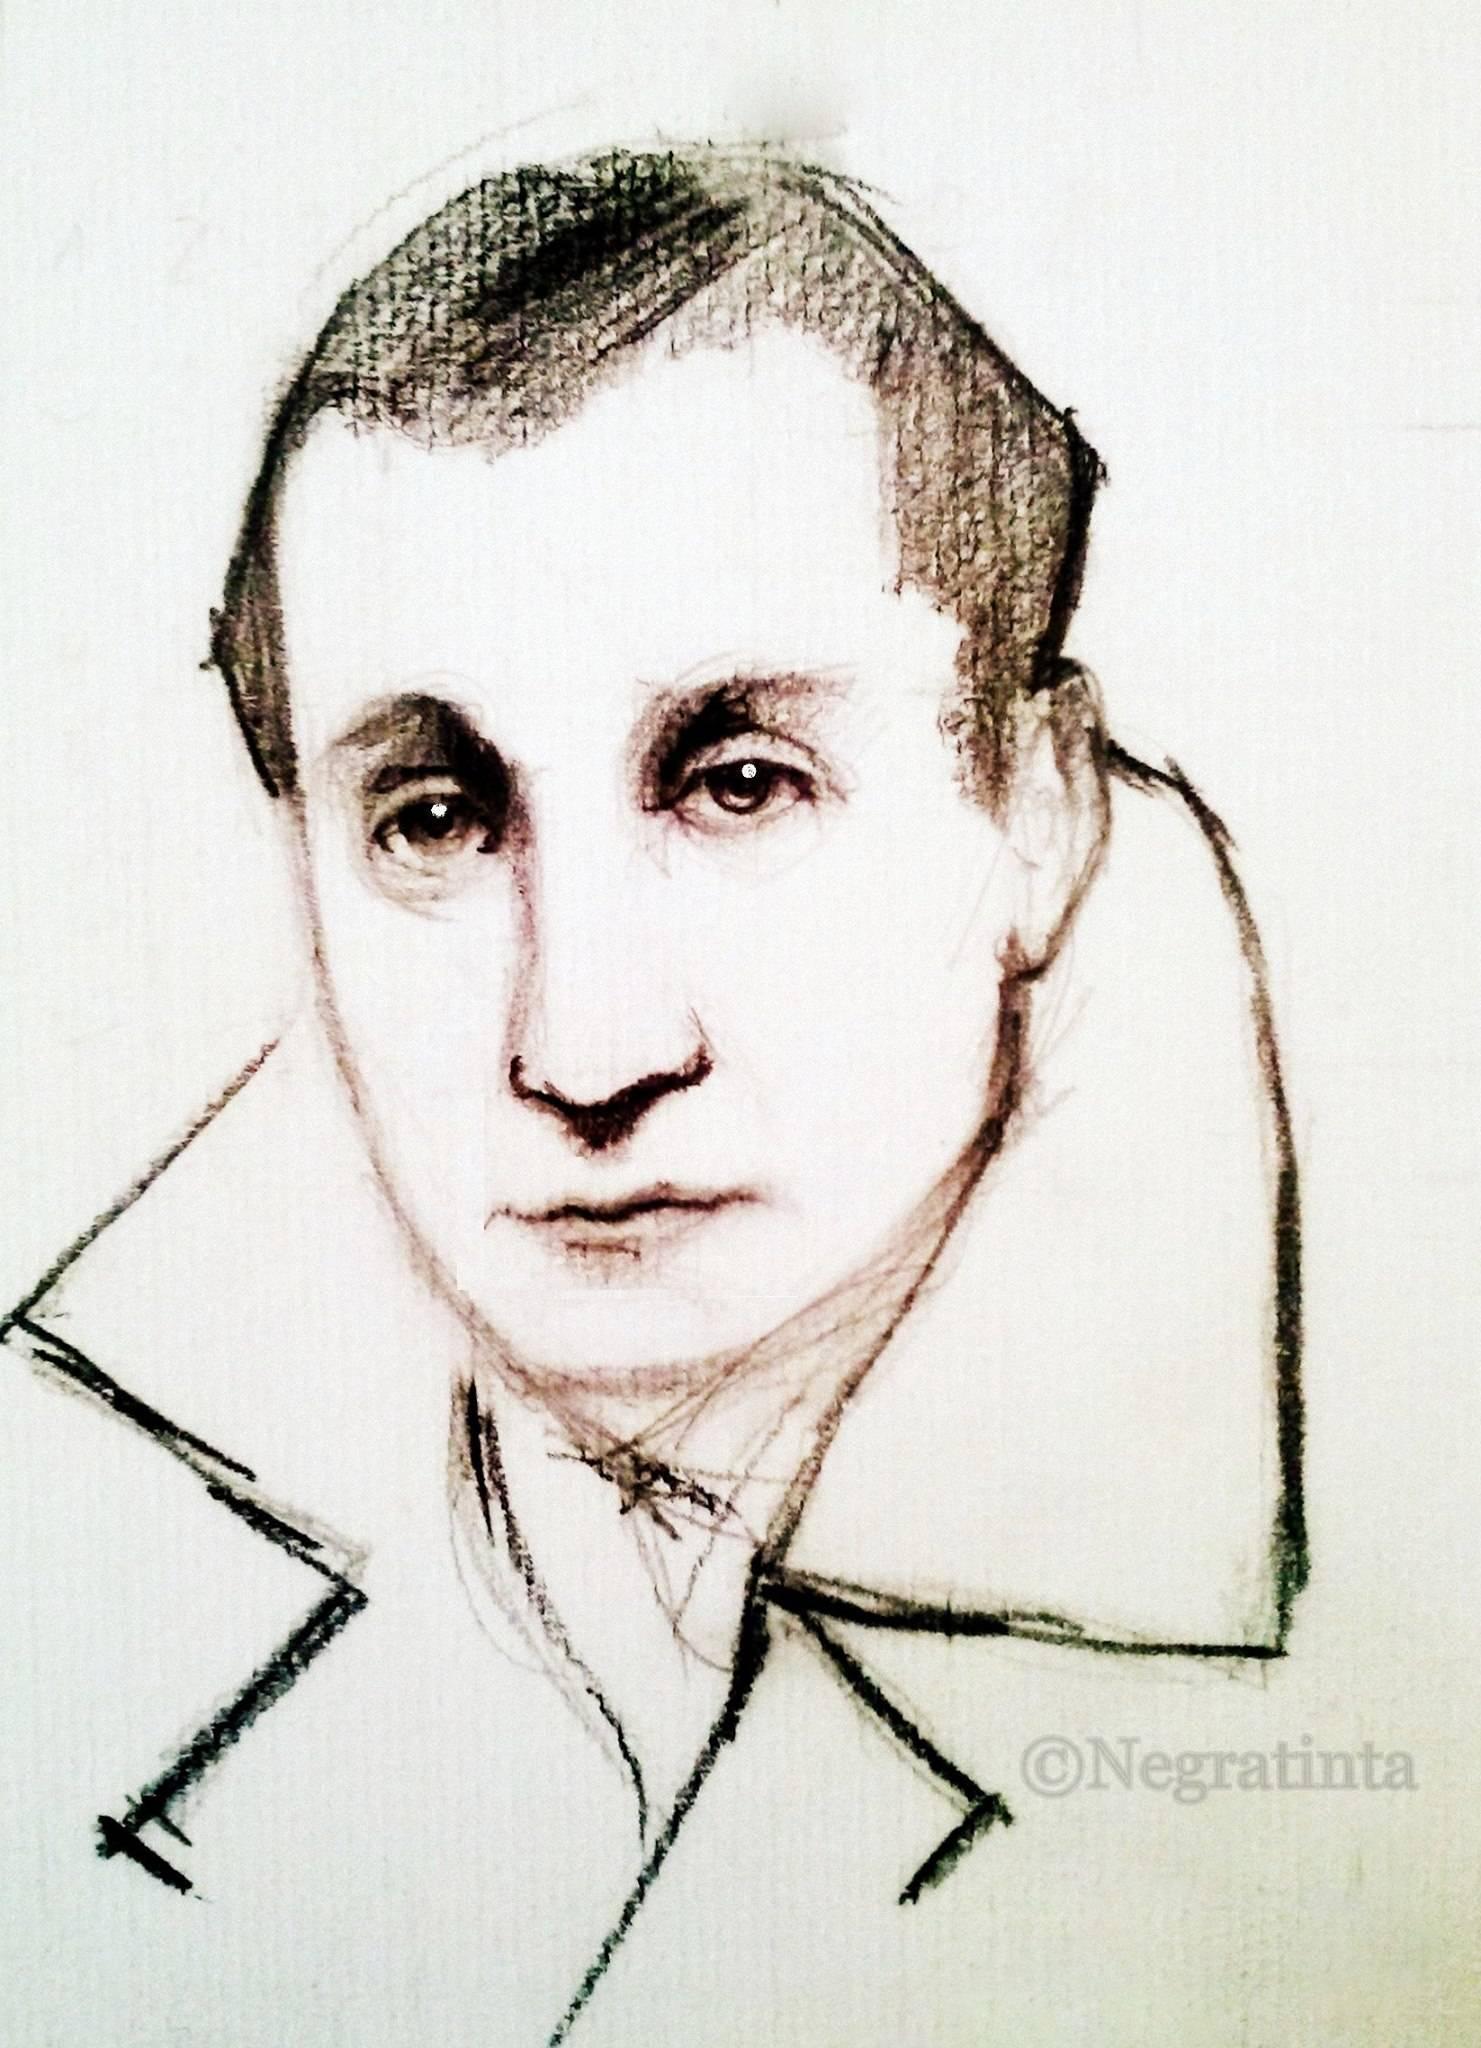 José Antonio Primo de Rivera. Jordi Berenguer